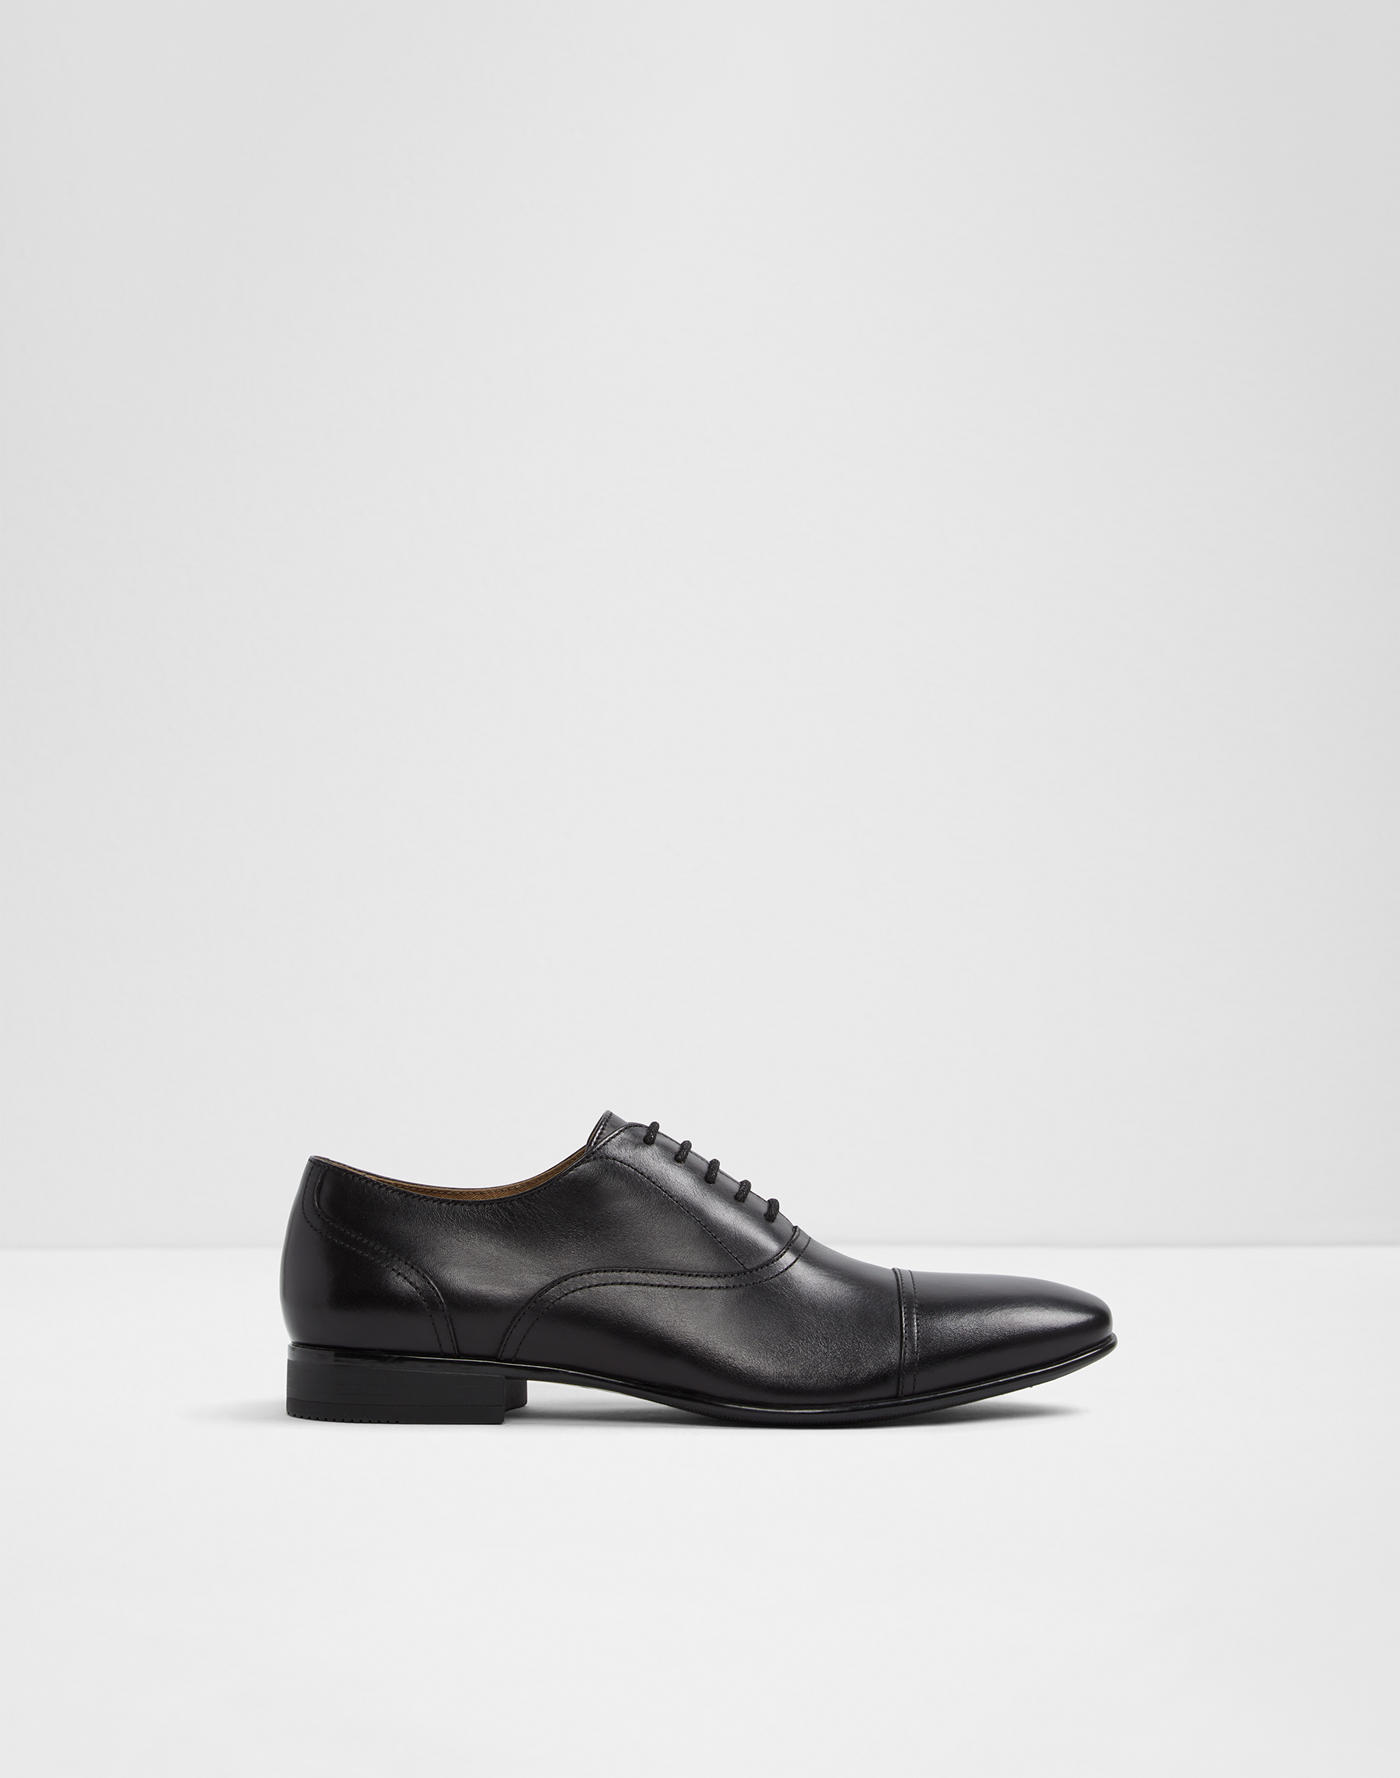 c0e5fc23fac3f0 All Men's Sales   Shoes, Accessories And Wallets   ALDO US   Aldoshoes.com  US